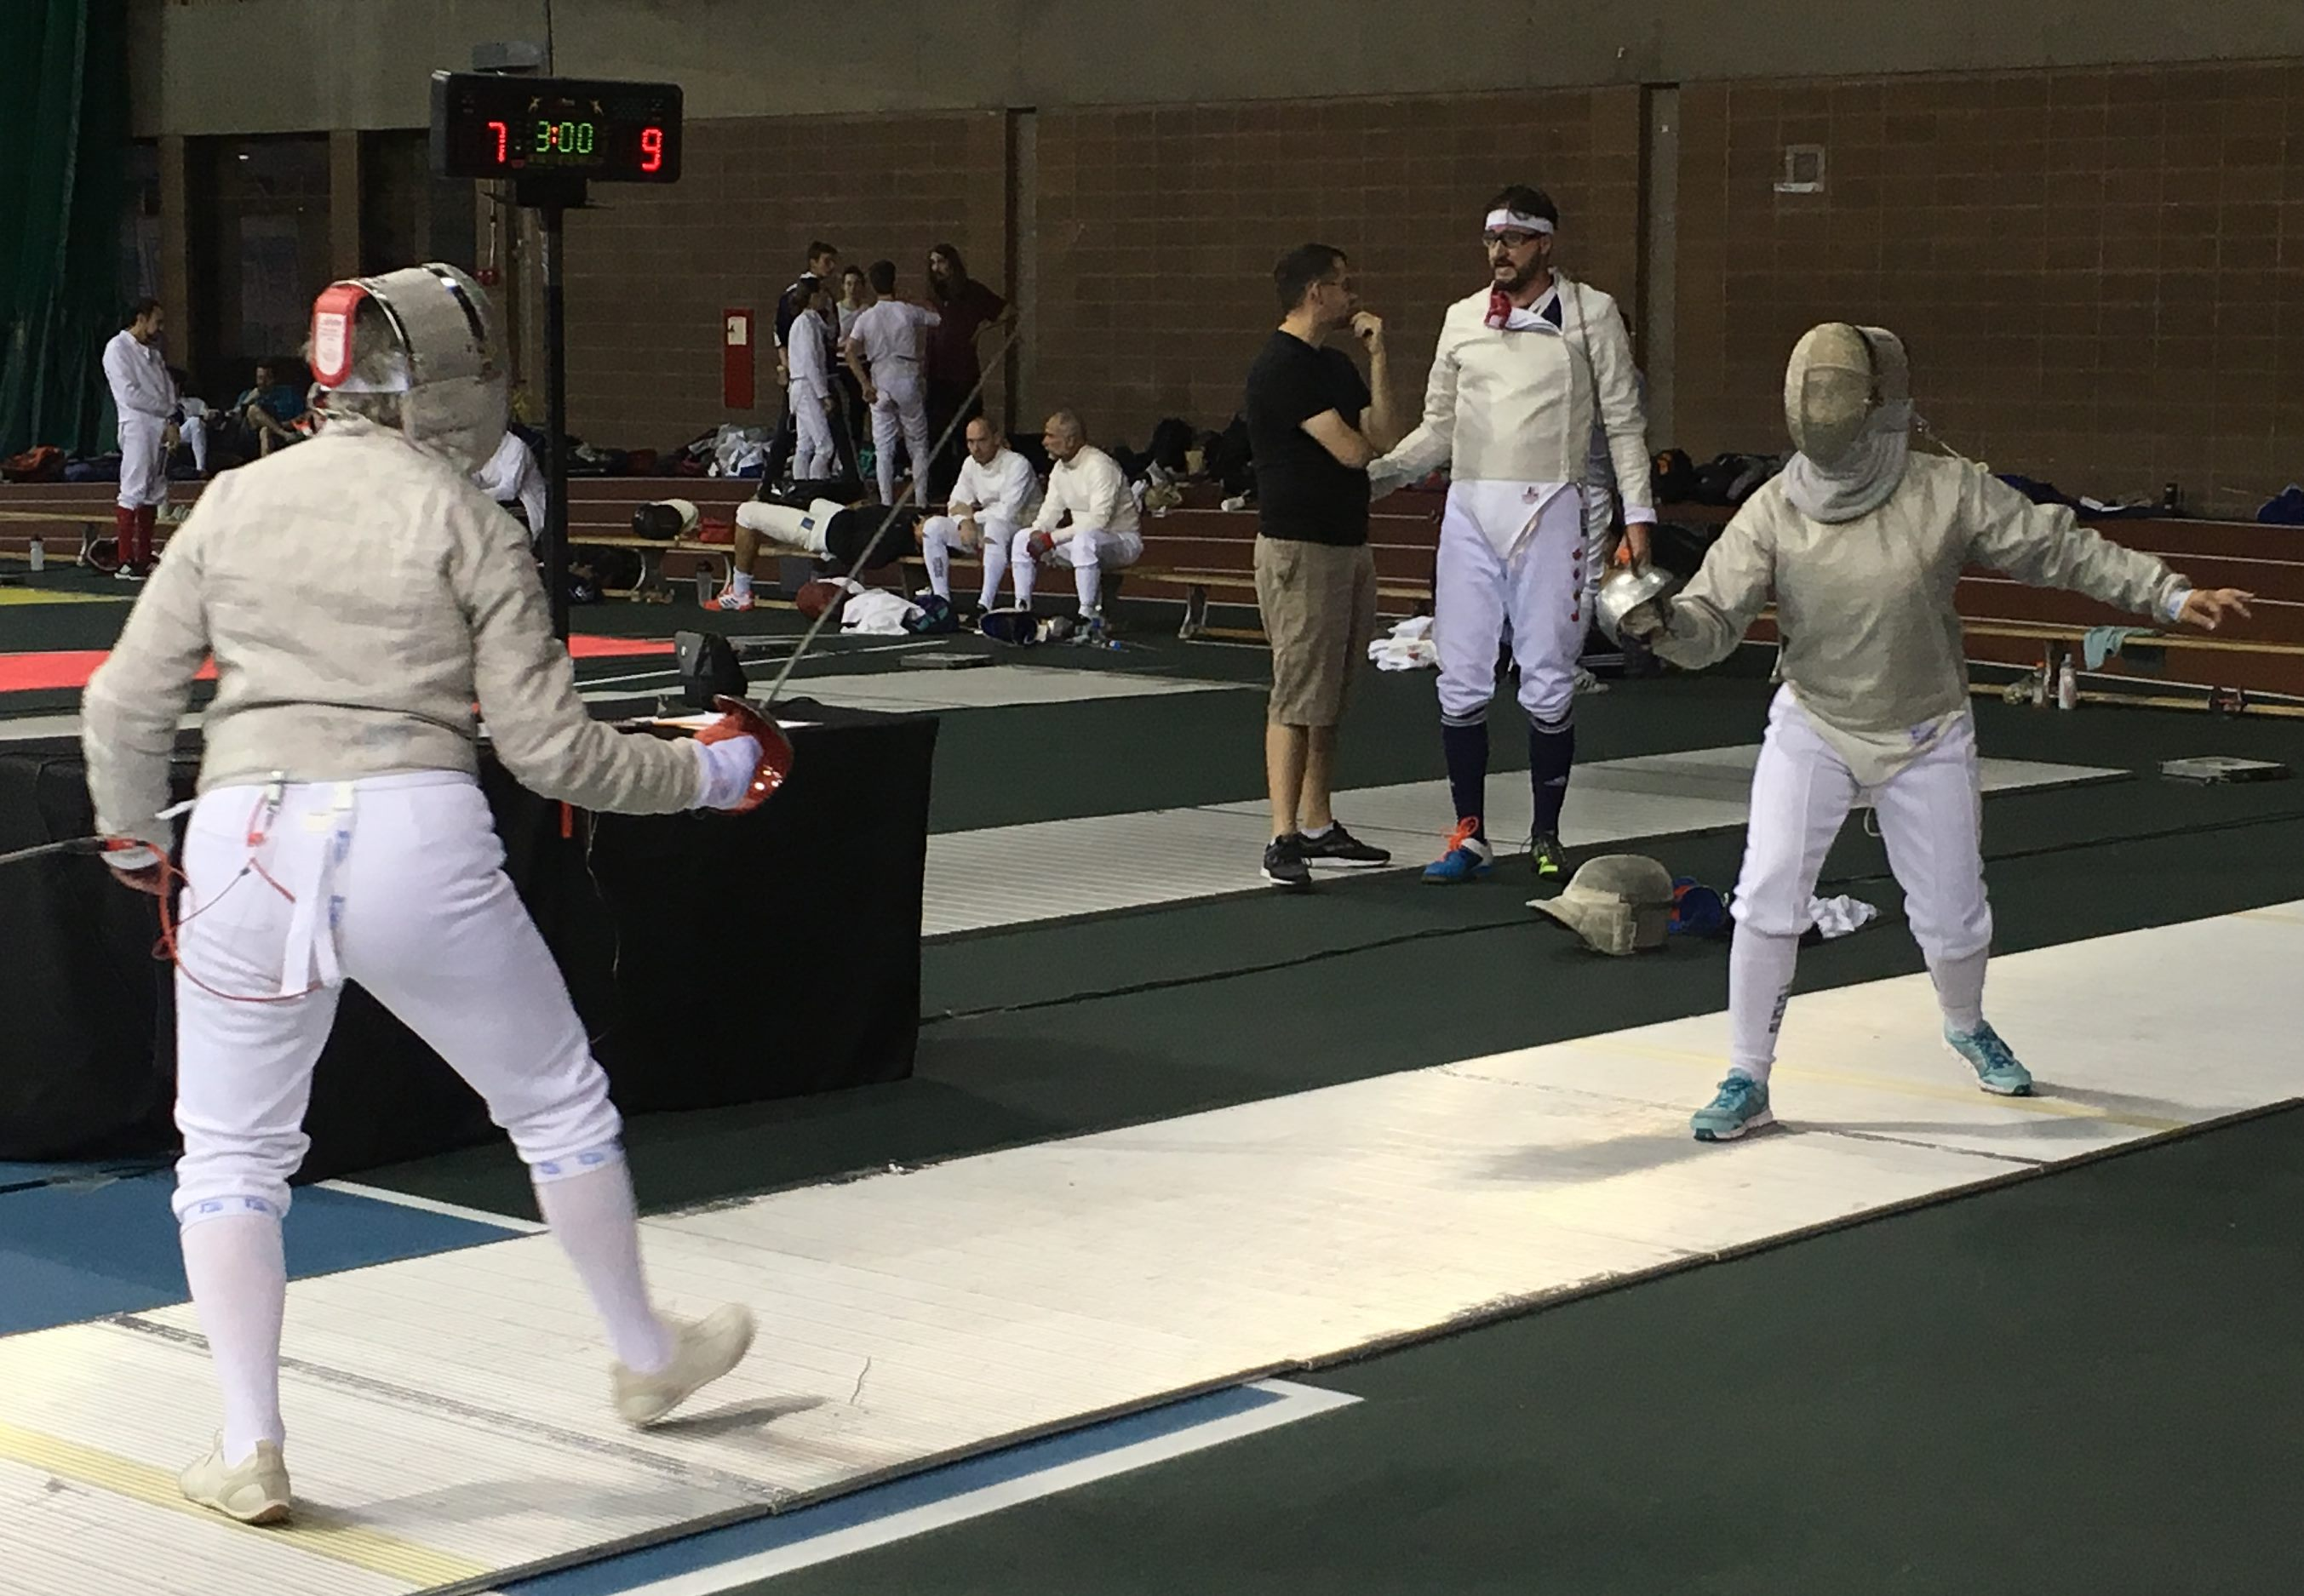 2017-09-24 Sandra Couture en combat m